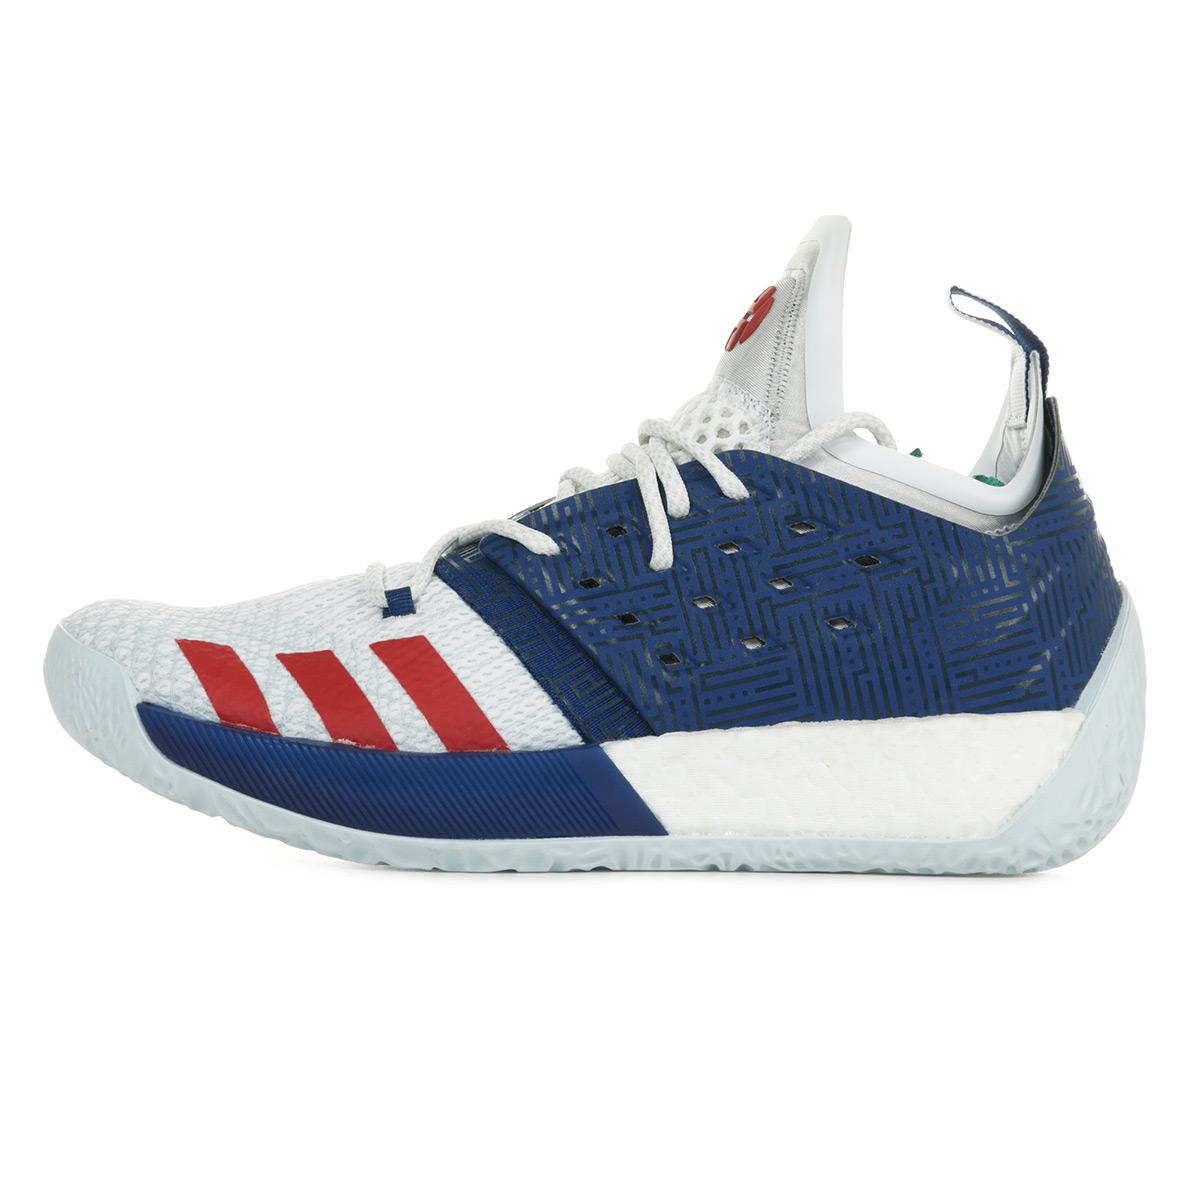 adidas Performance Harden Vol. 2 USA AQ0026, Basketball homme